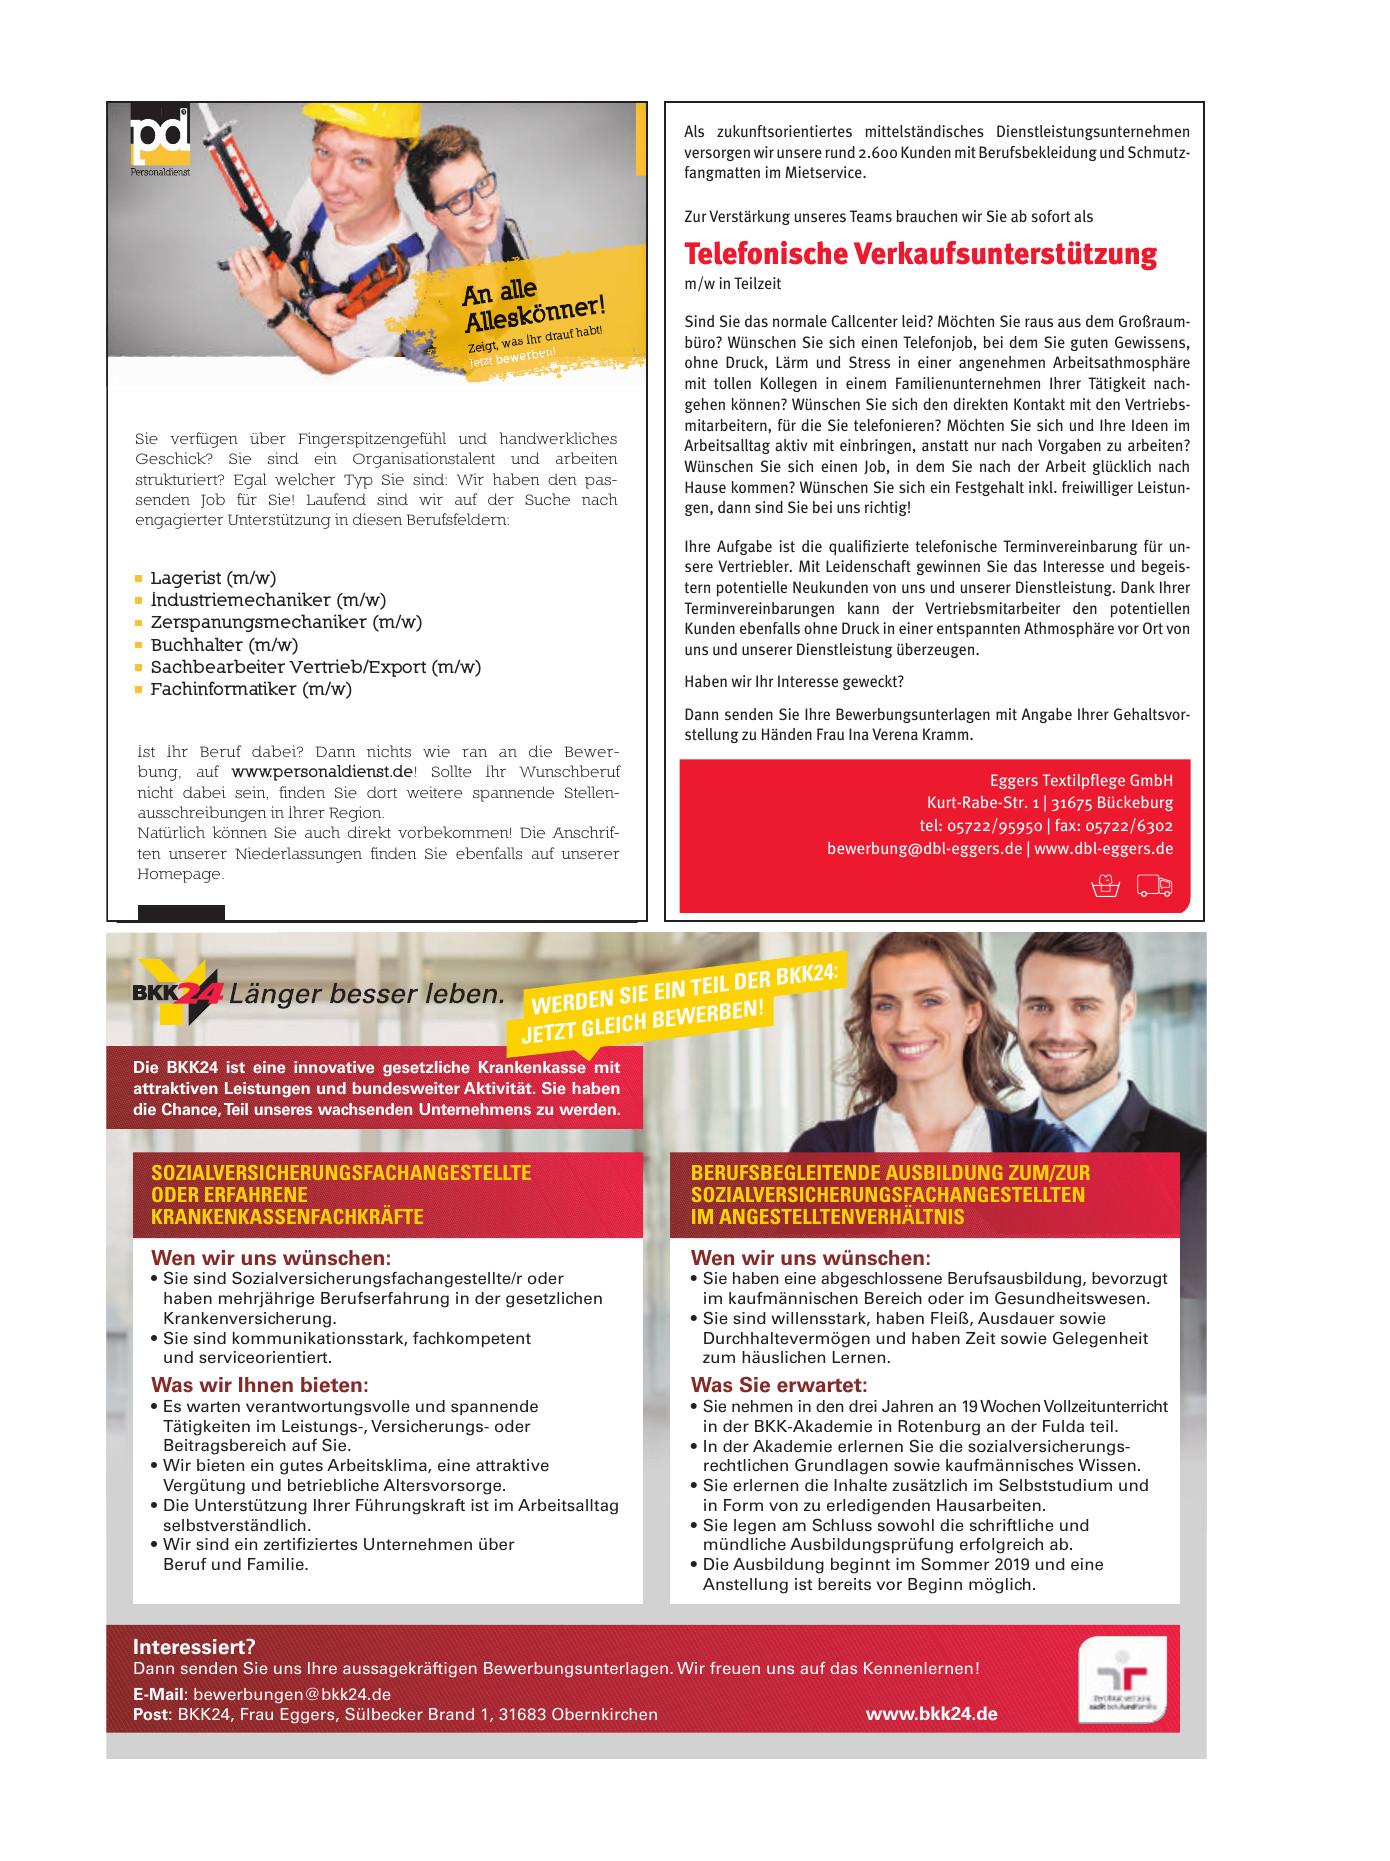 authoritative point view, Partnervermittlung verordnung ready help you